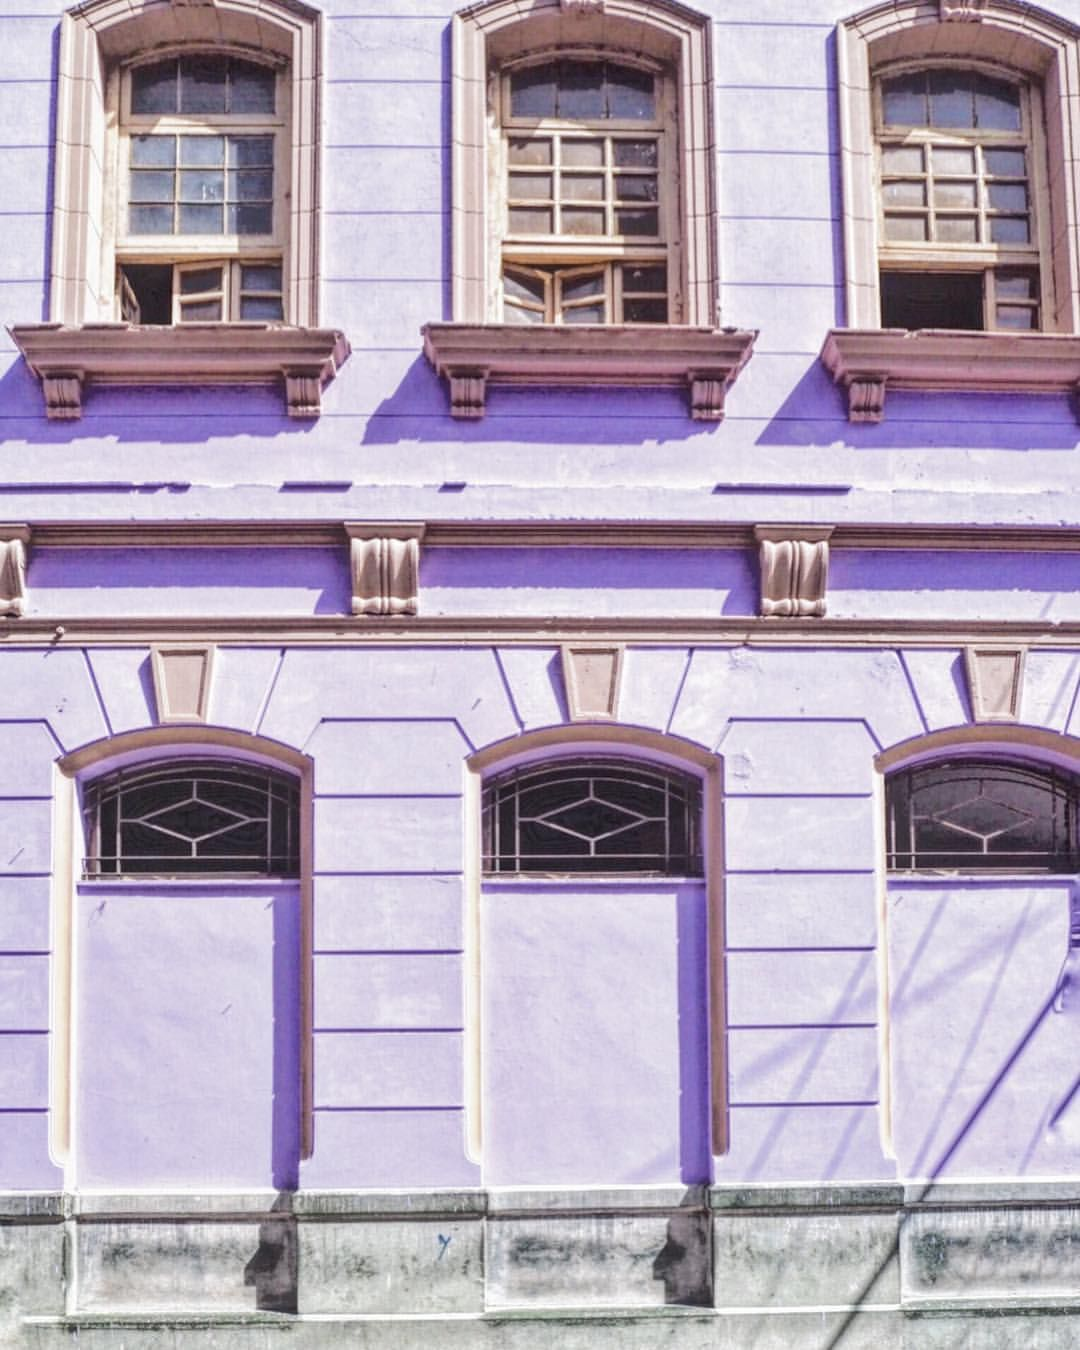 Lavender Color Building In Habana ただただinstagramのフィード